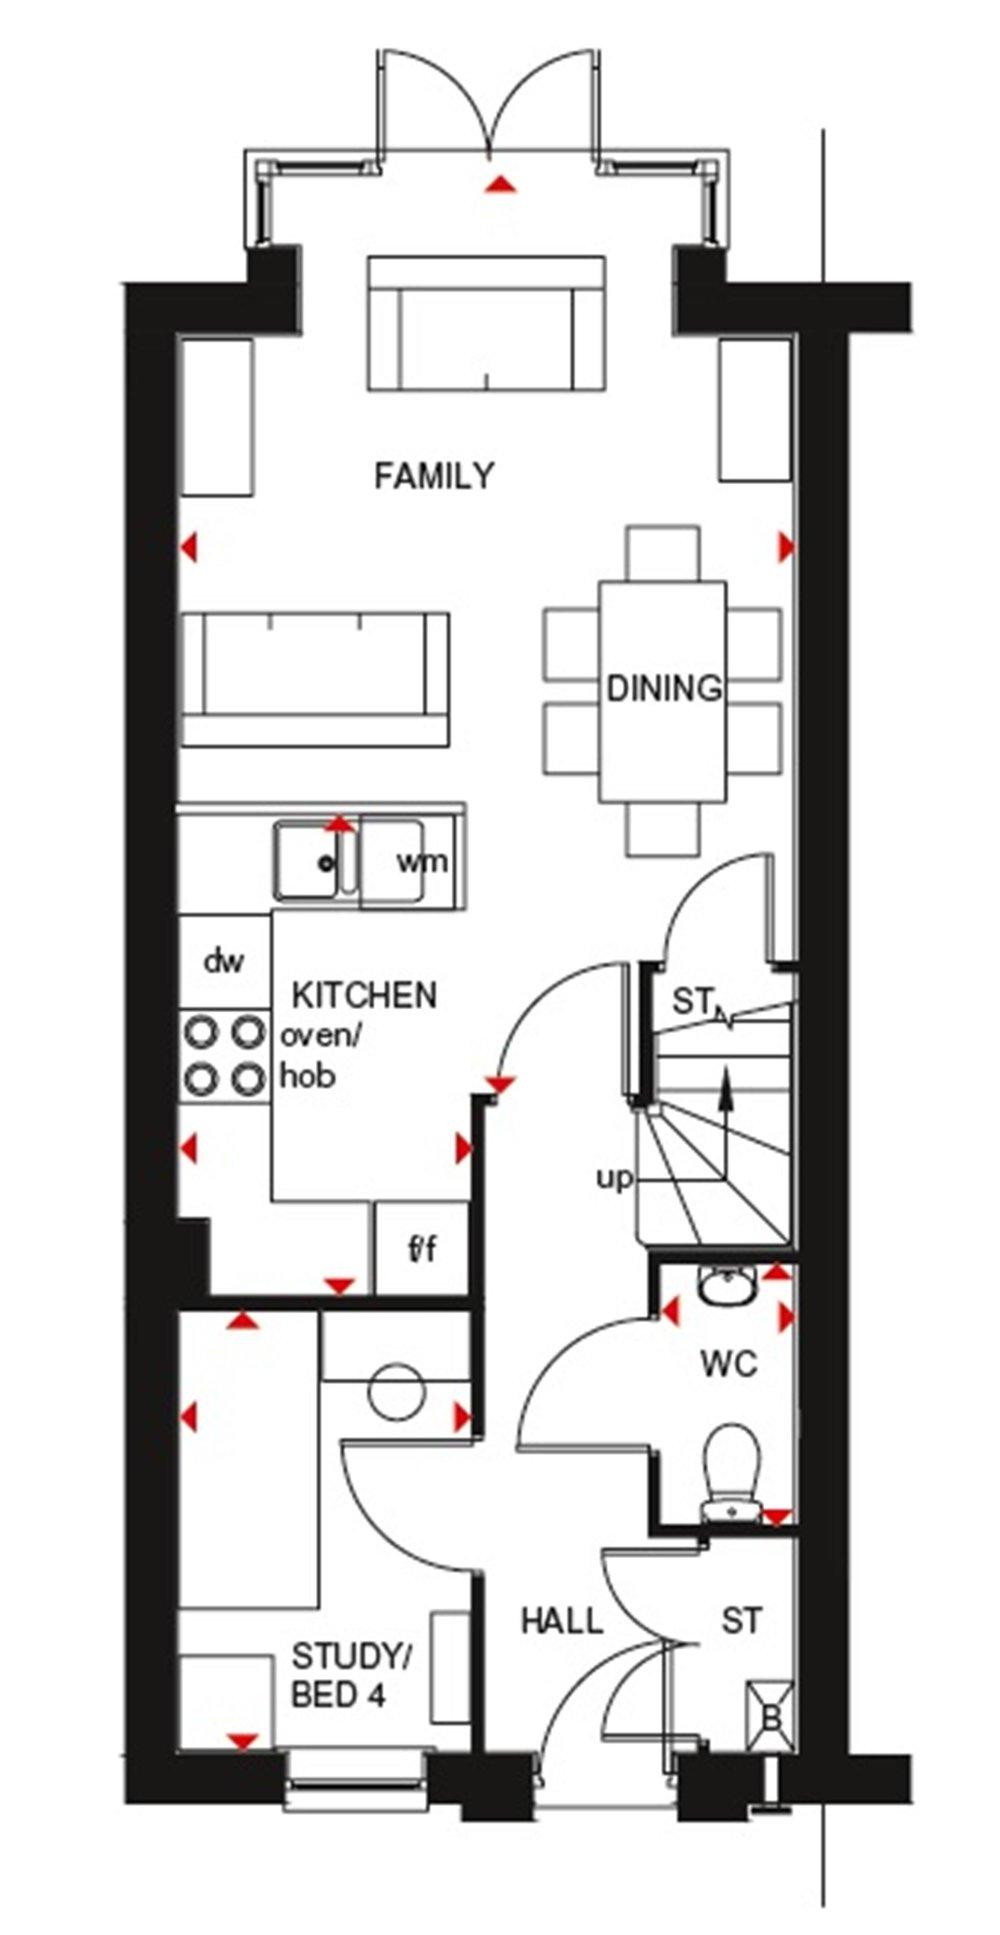 Fawley_ground floor.jpg